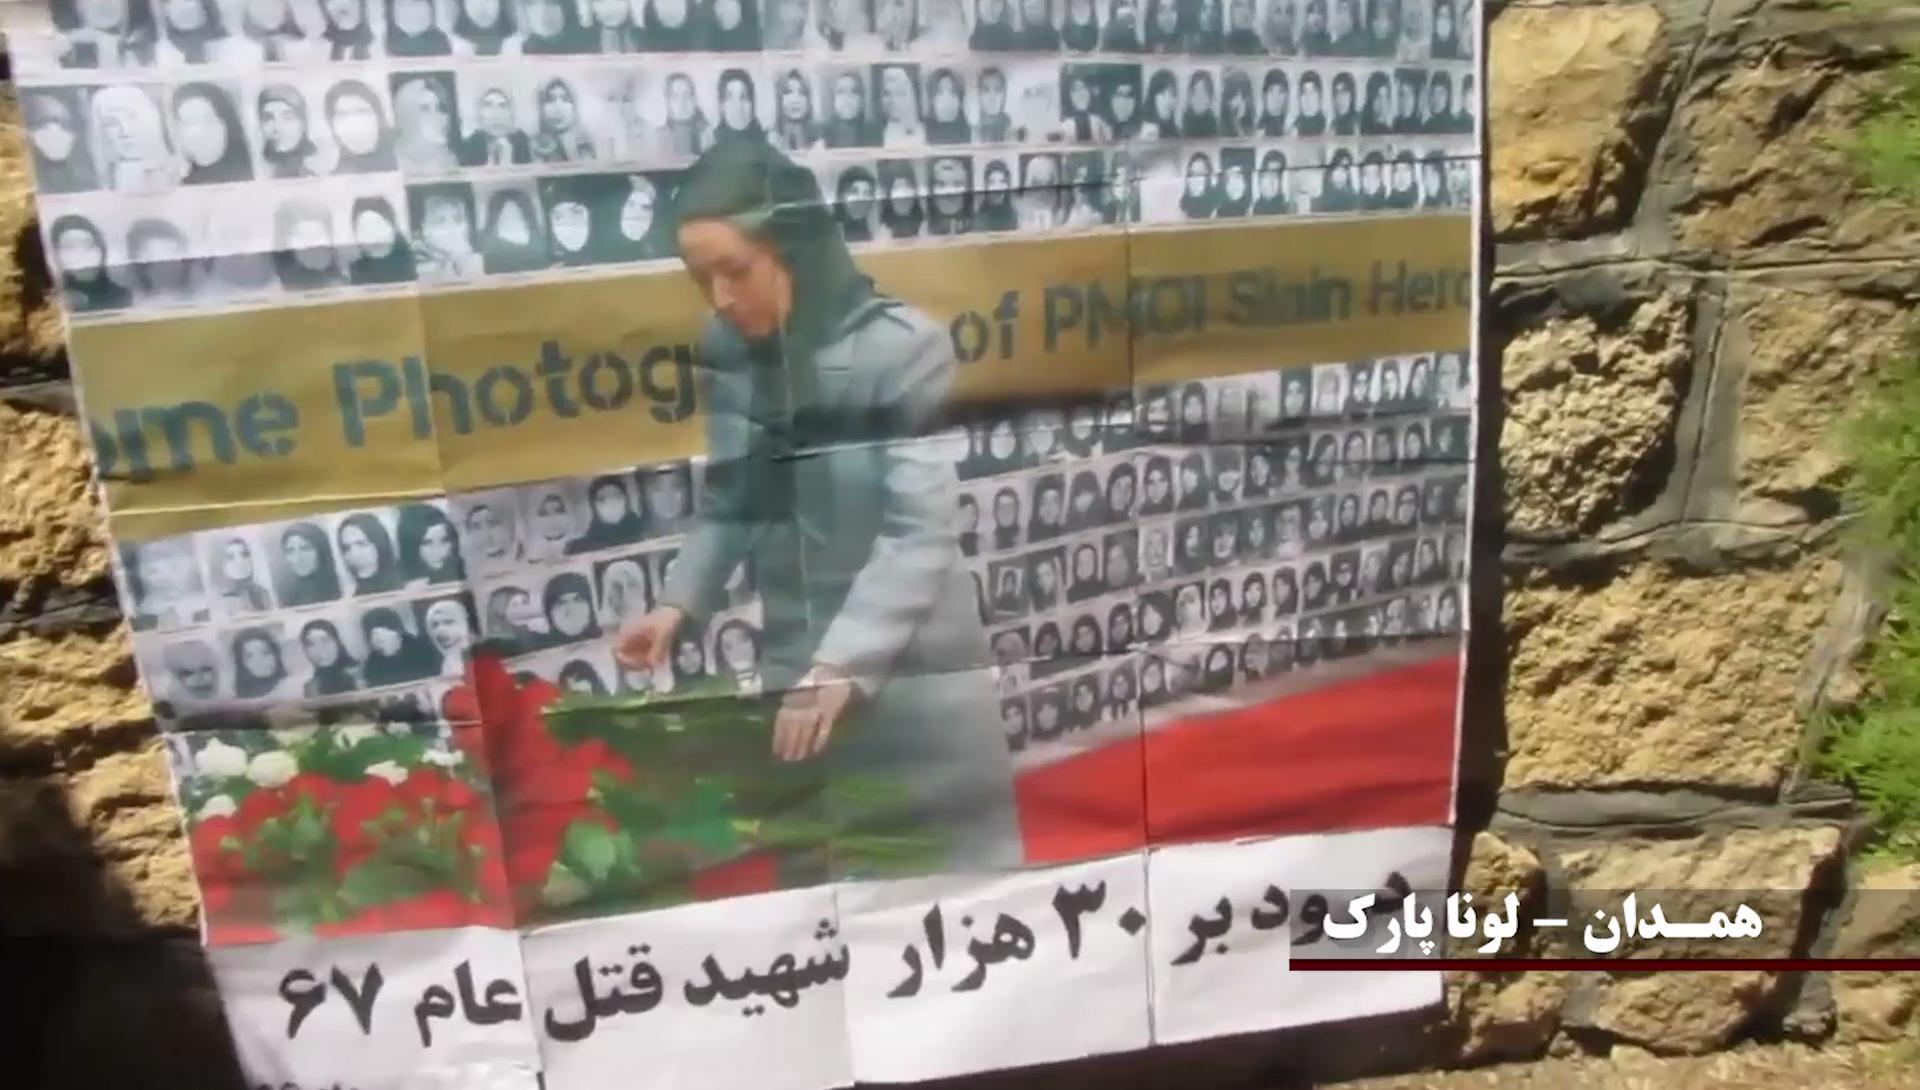 همدان - لونا پارک - جنبش دادخواهی